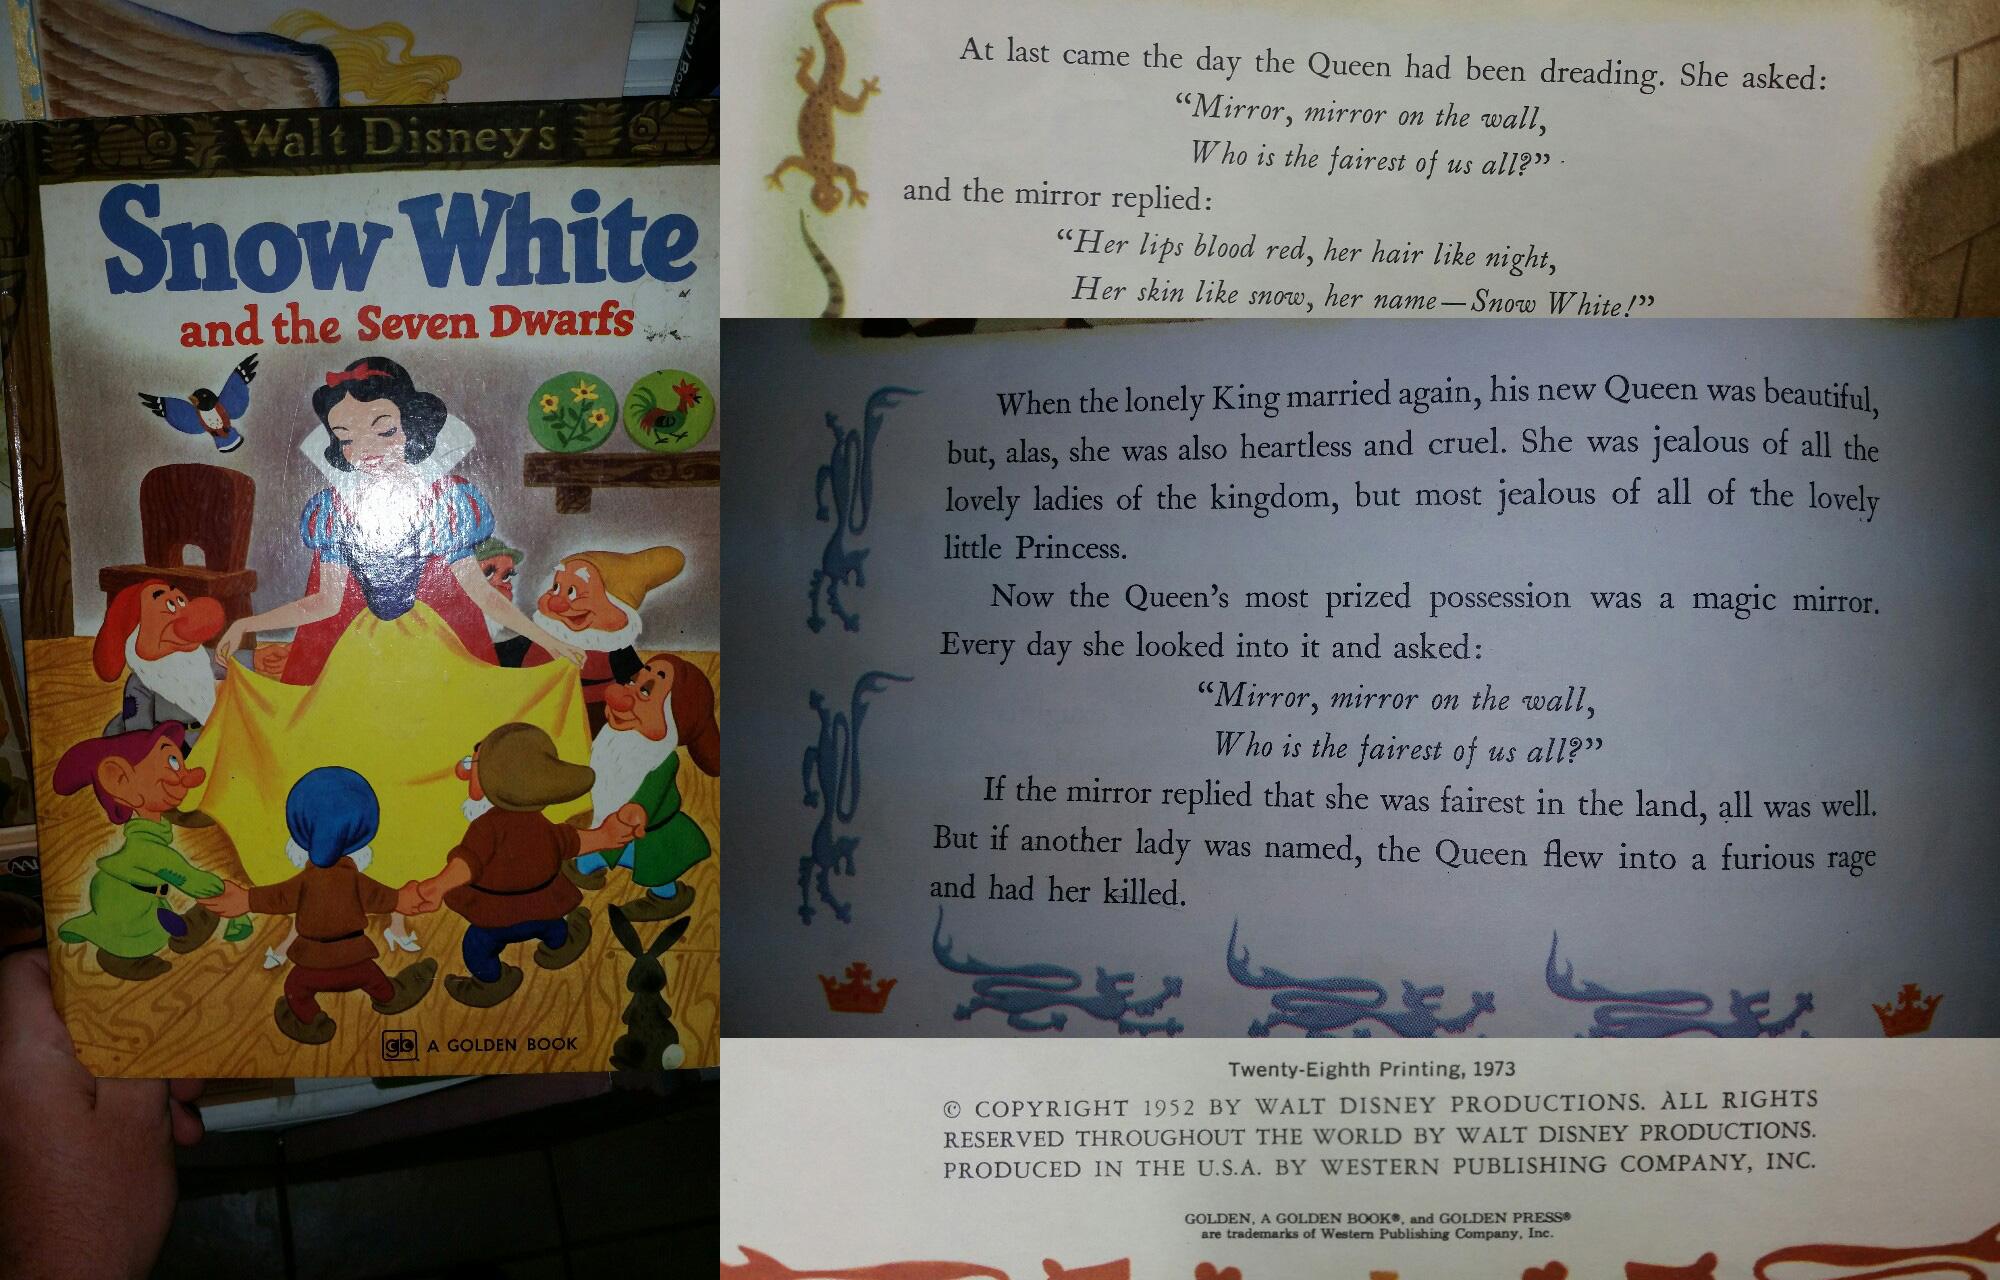 1973 Disney Book Showing Mirror